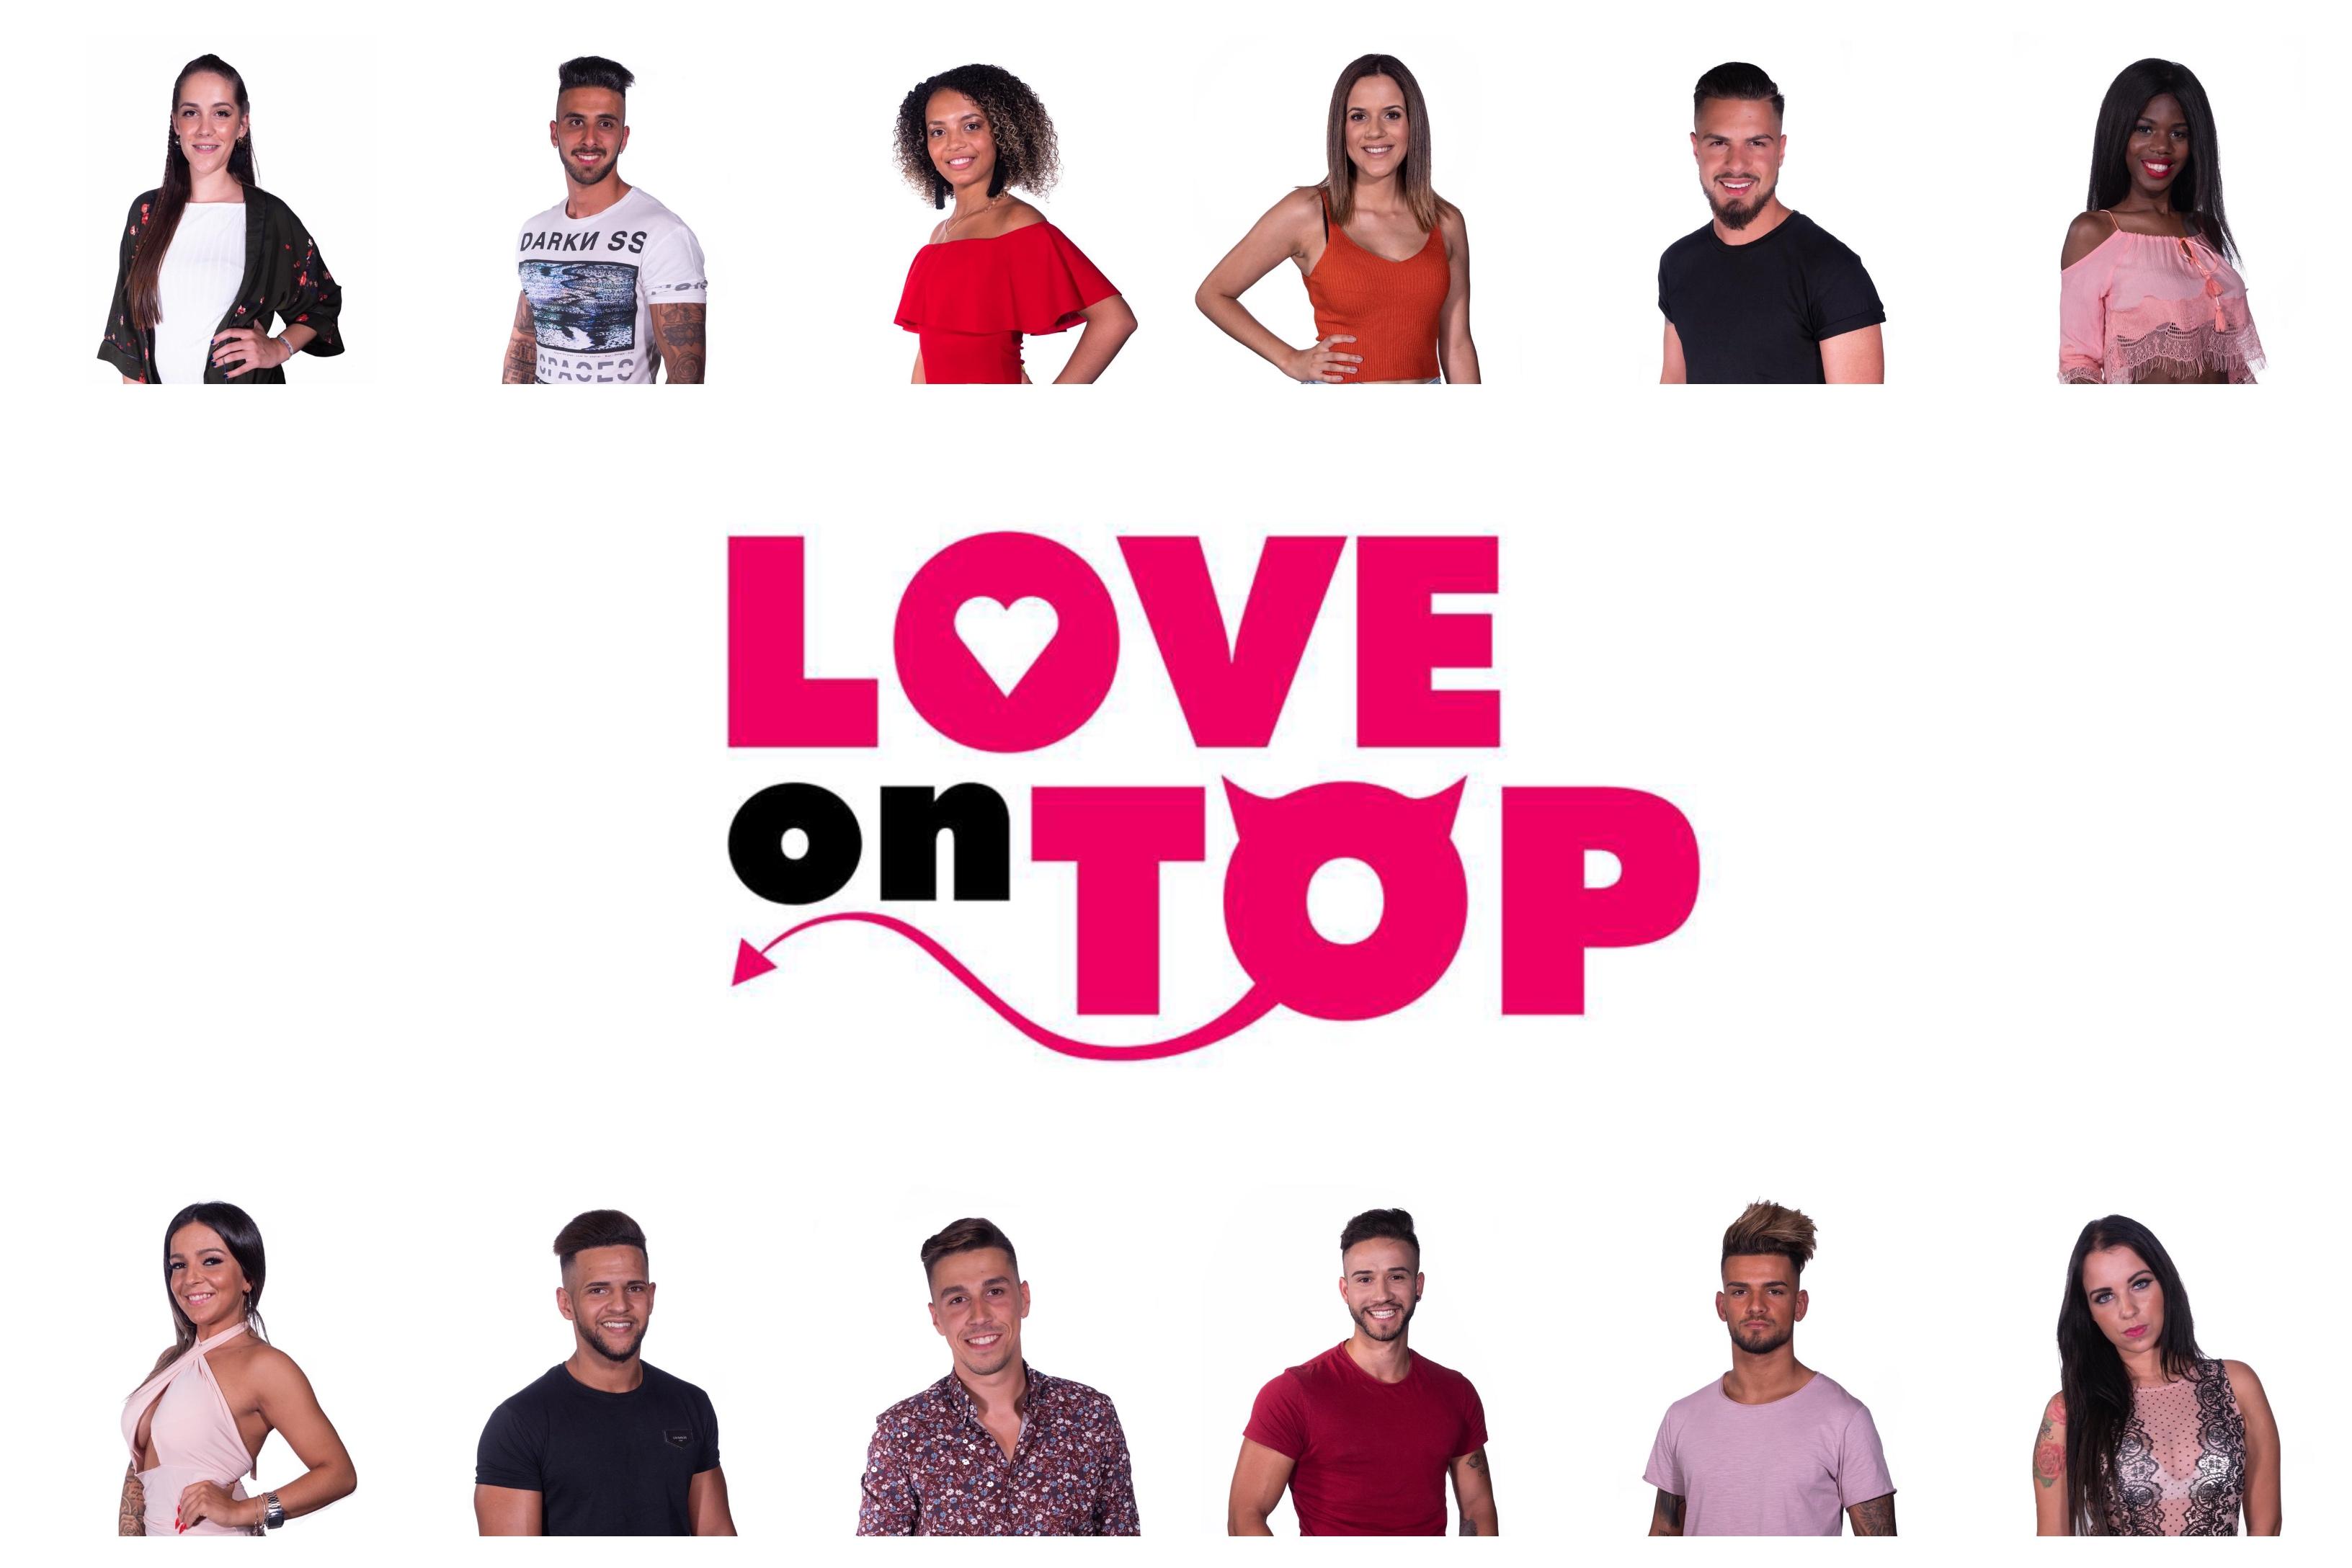 Love On Top 7 Concorrentes Atelevisao Bronca: Concorrentes Do «Love On Top 7» Queixam-Se De Falta De Comida